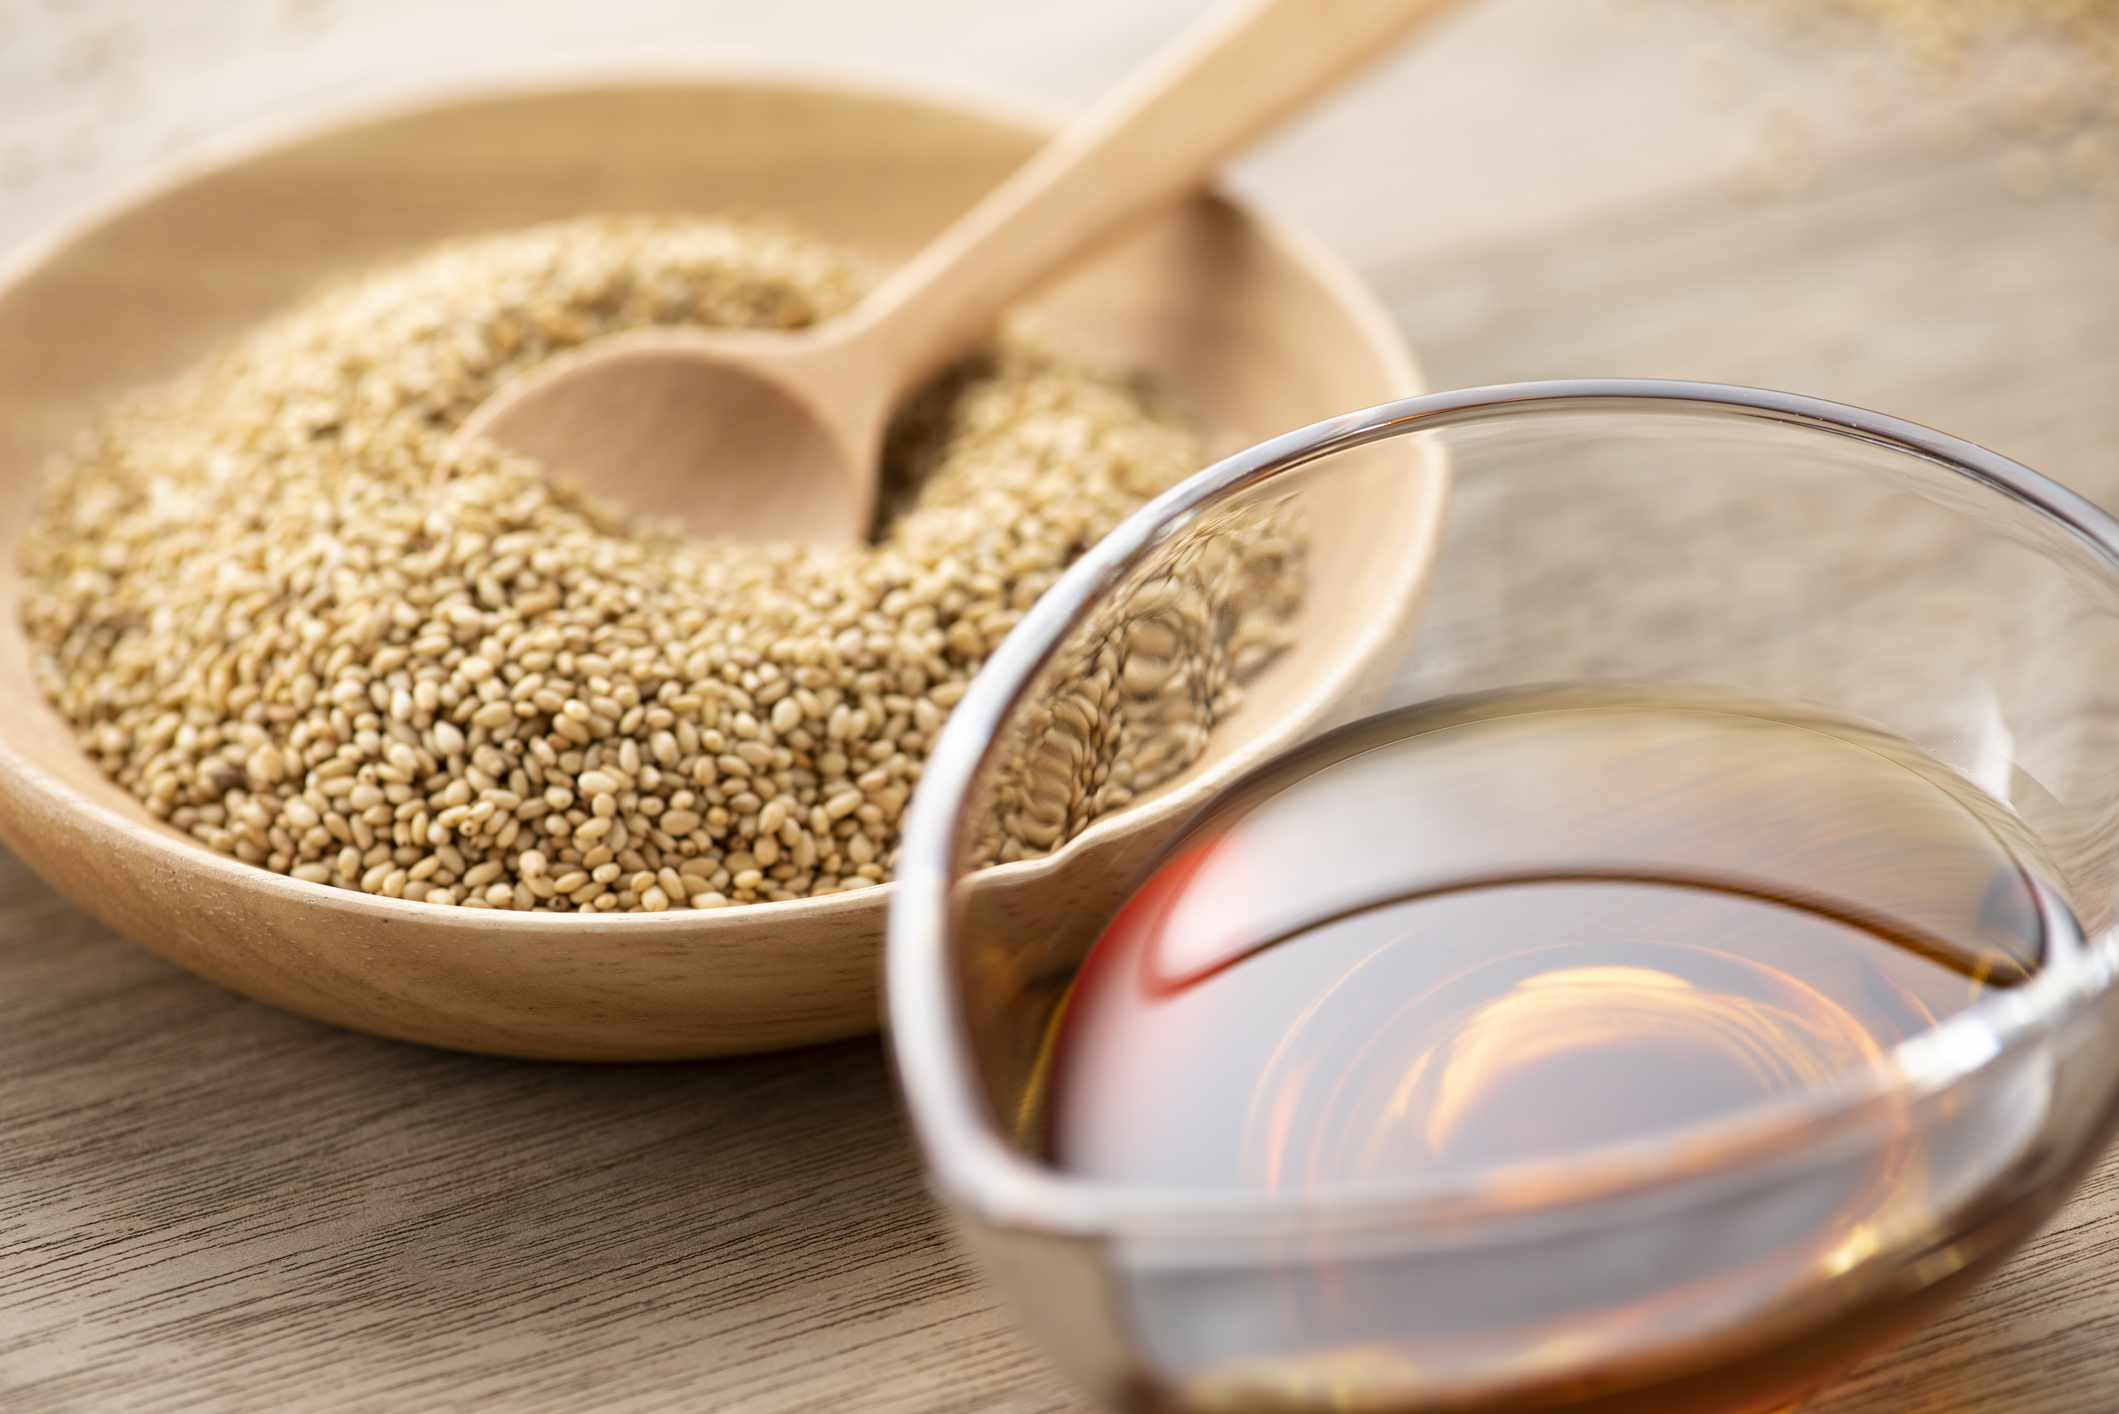 Roasted sesame seeds and sesame oil